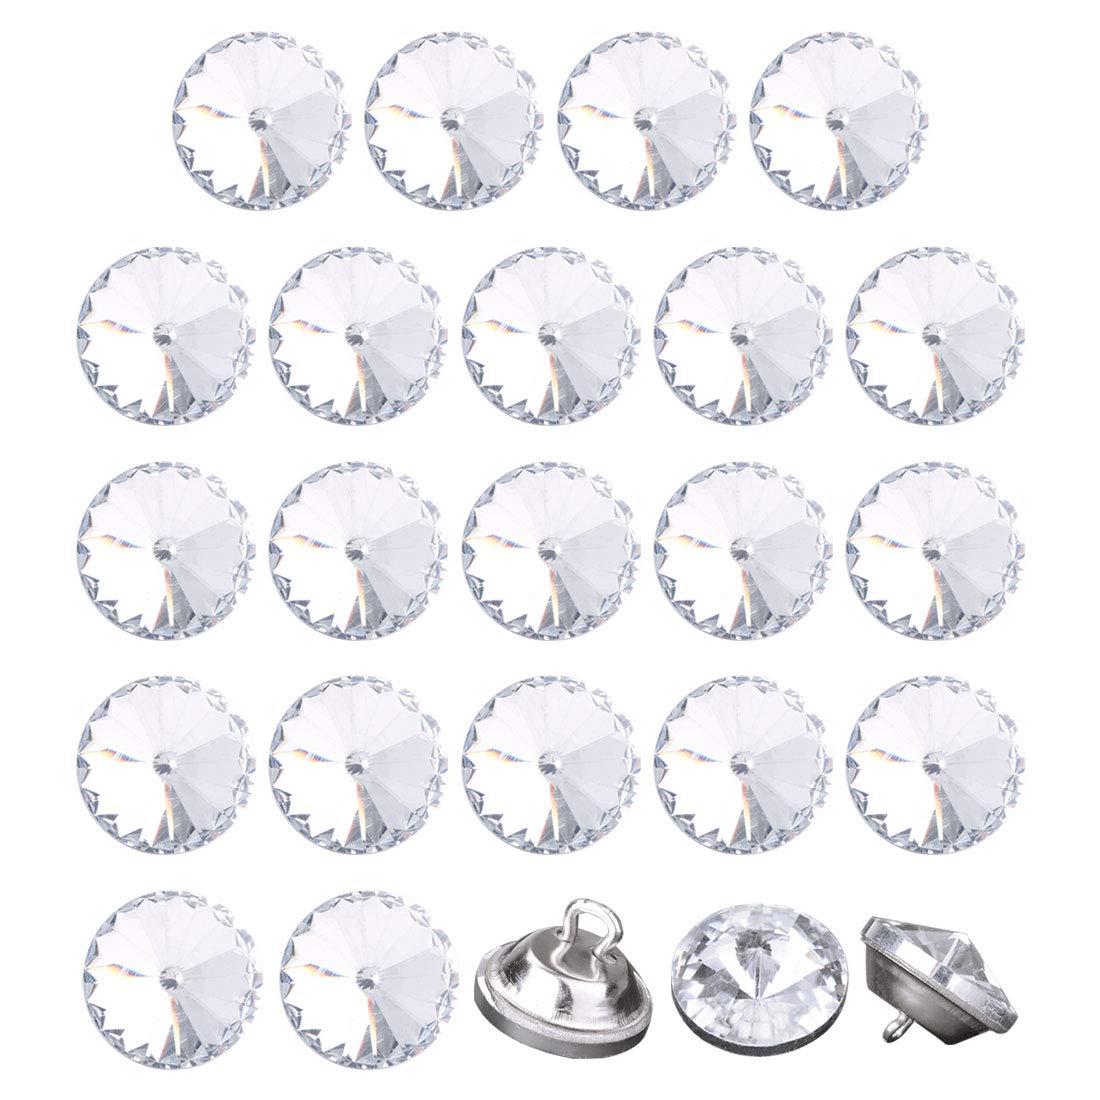 uxcell 24pcs Furniture Tack Nails 12mm Dia Round Head Diamond Shape Glass Thumbtack DIY Sofa Buttons Headboard Crafts Decorate Silver Tone